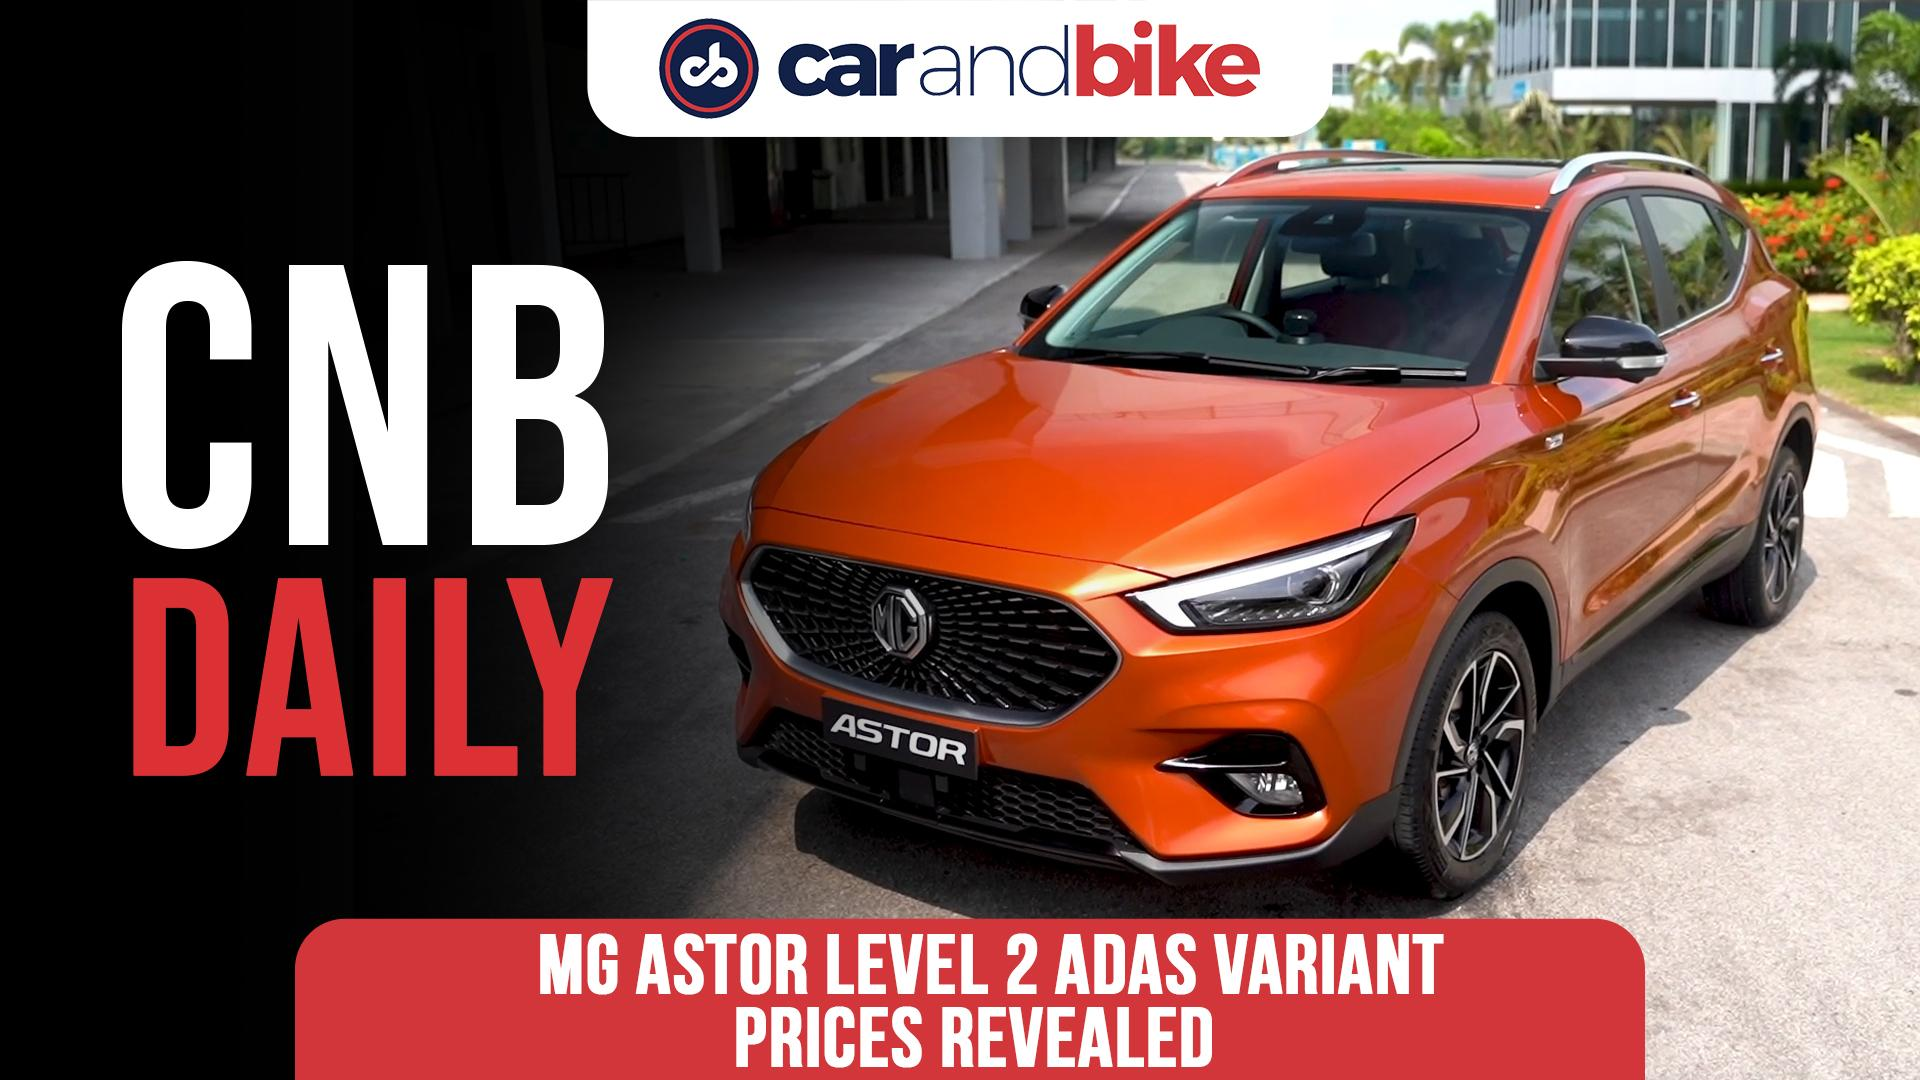 MG Astor Level 2 ADAS variant prices revealed